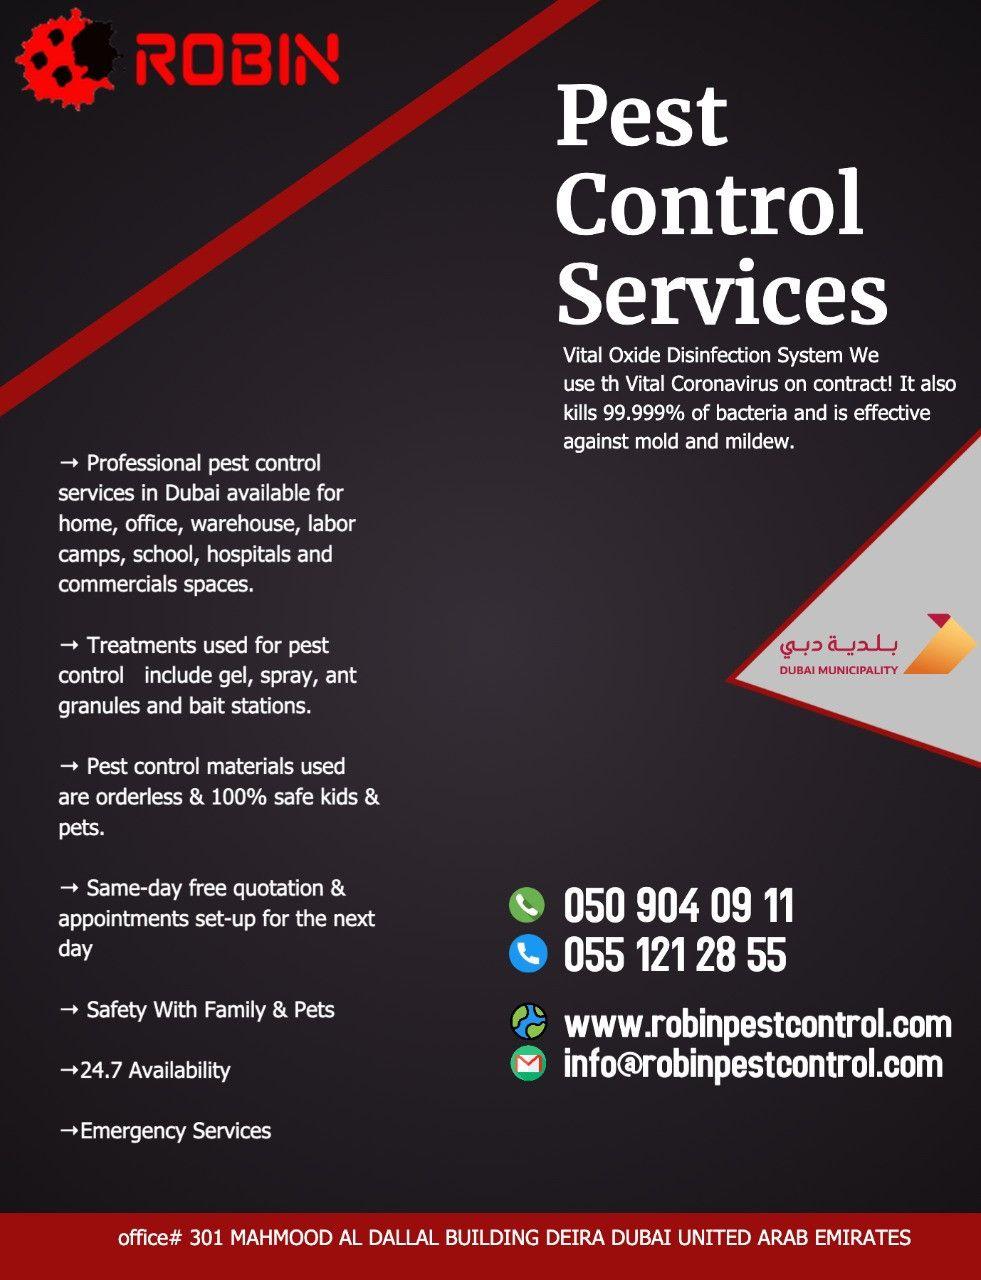 Robin Pest Control 26